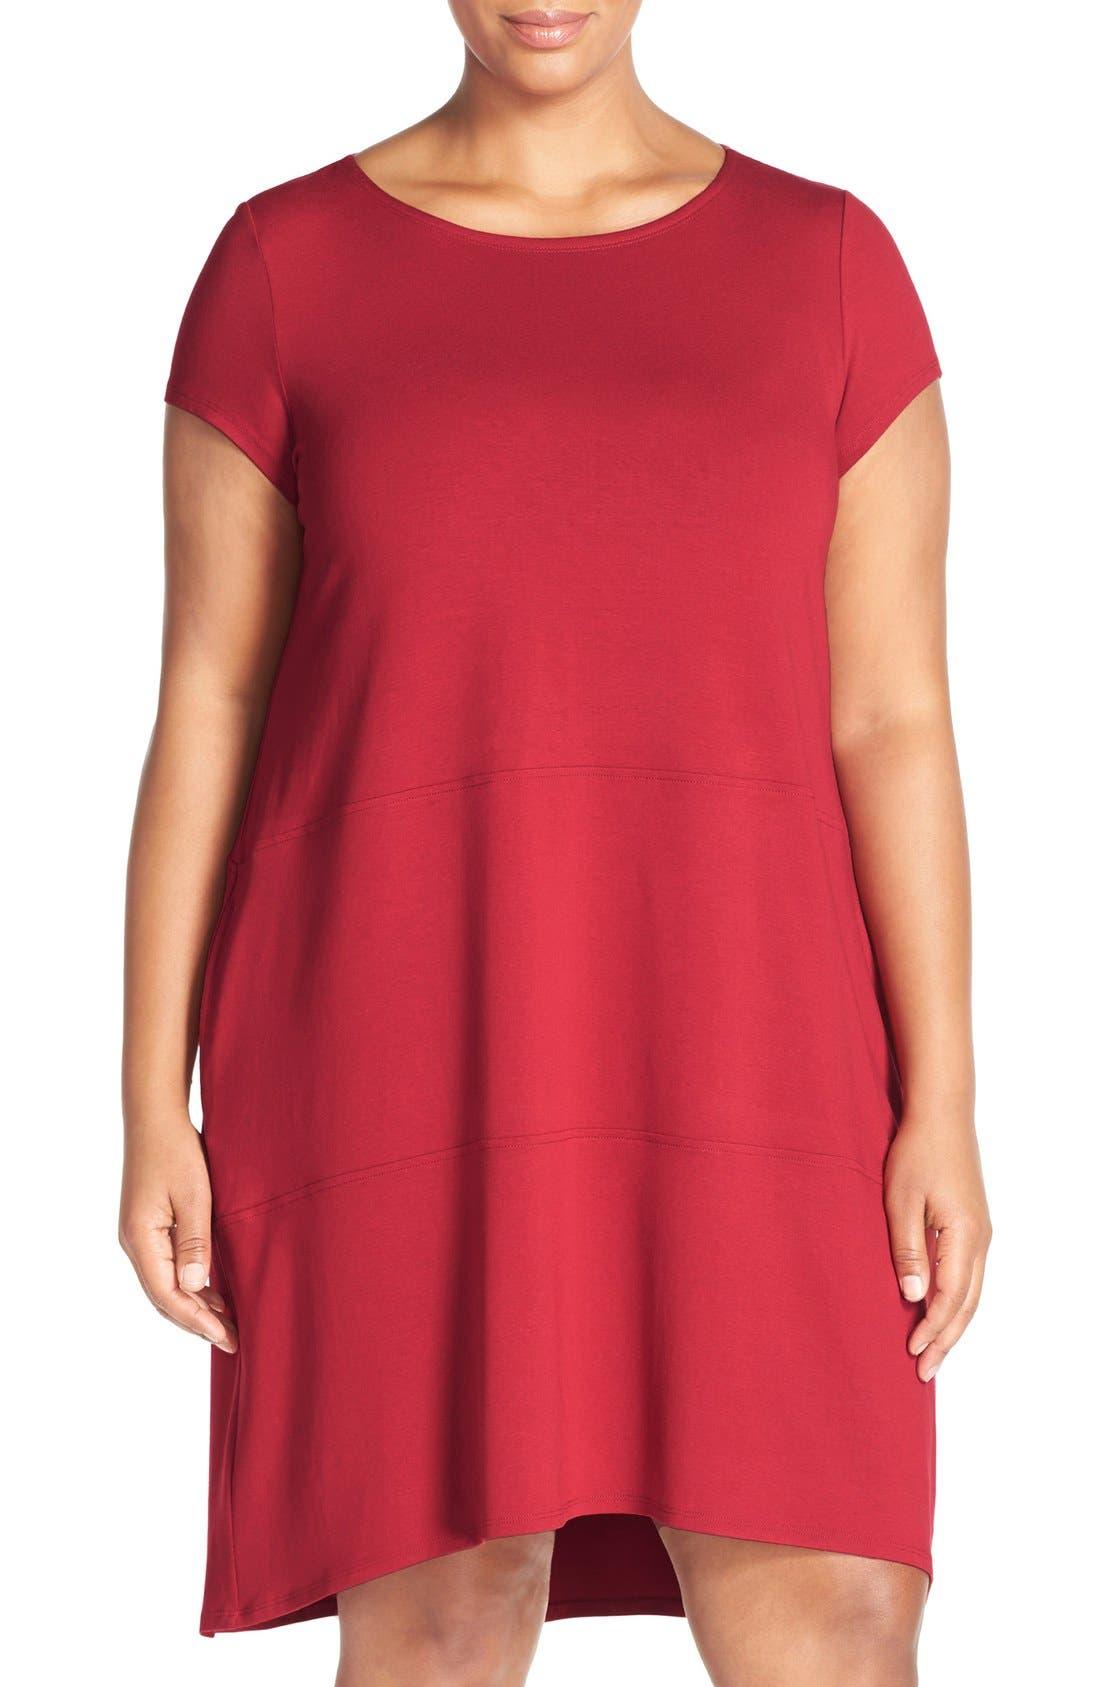 Main Image - Eileen Fisher Bateau Neck Cap Sleeve Dress (Plus Size)